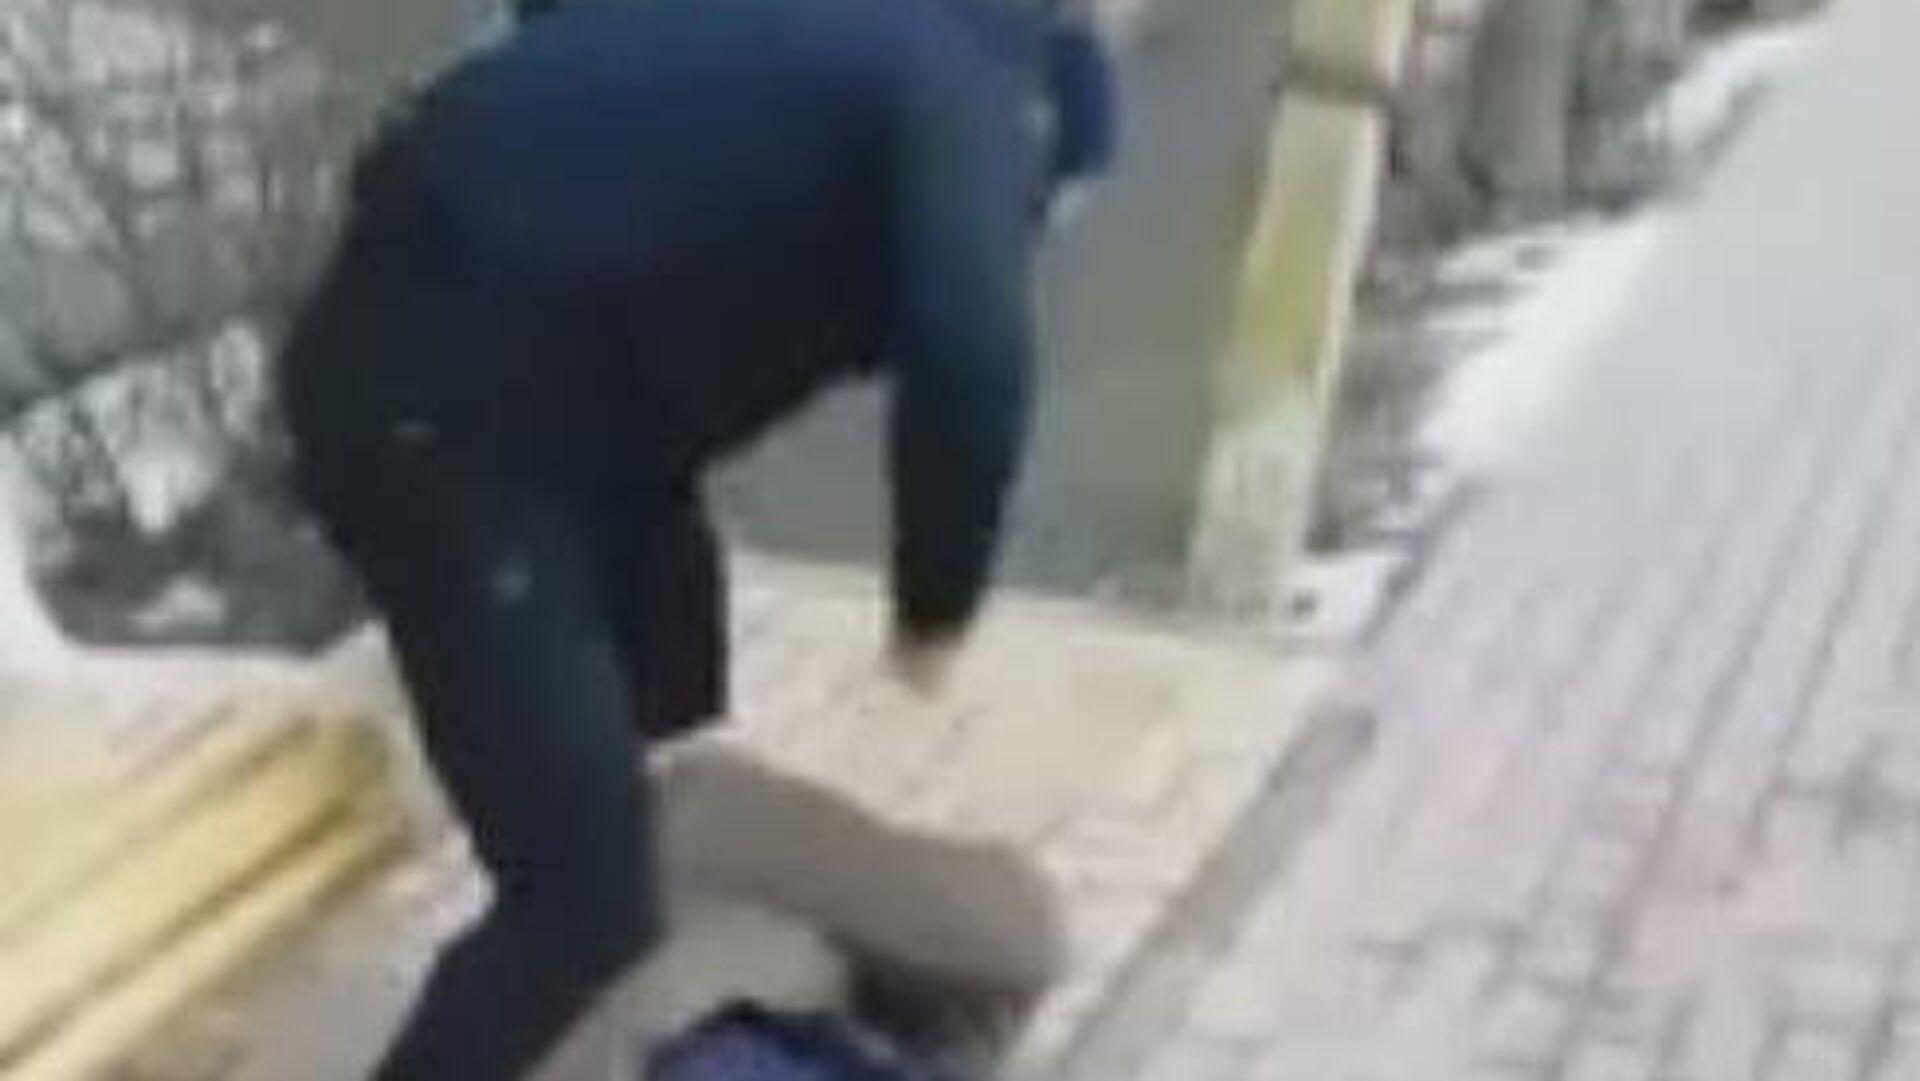 Подростки избивают мужчину. Стоп-кадр видео - РИА Новости, 1920, 23.03.2020